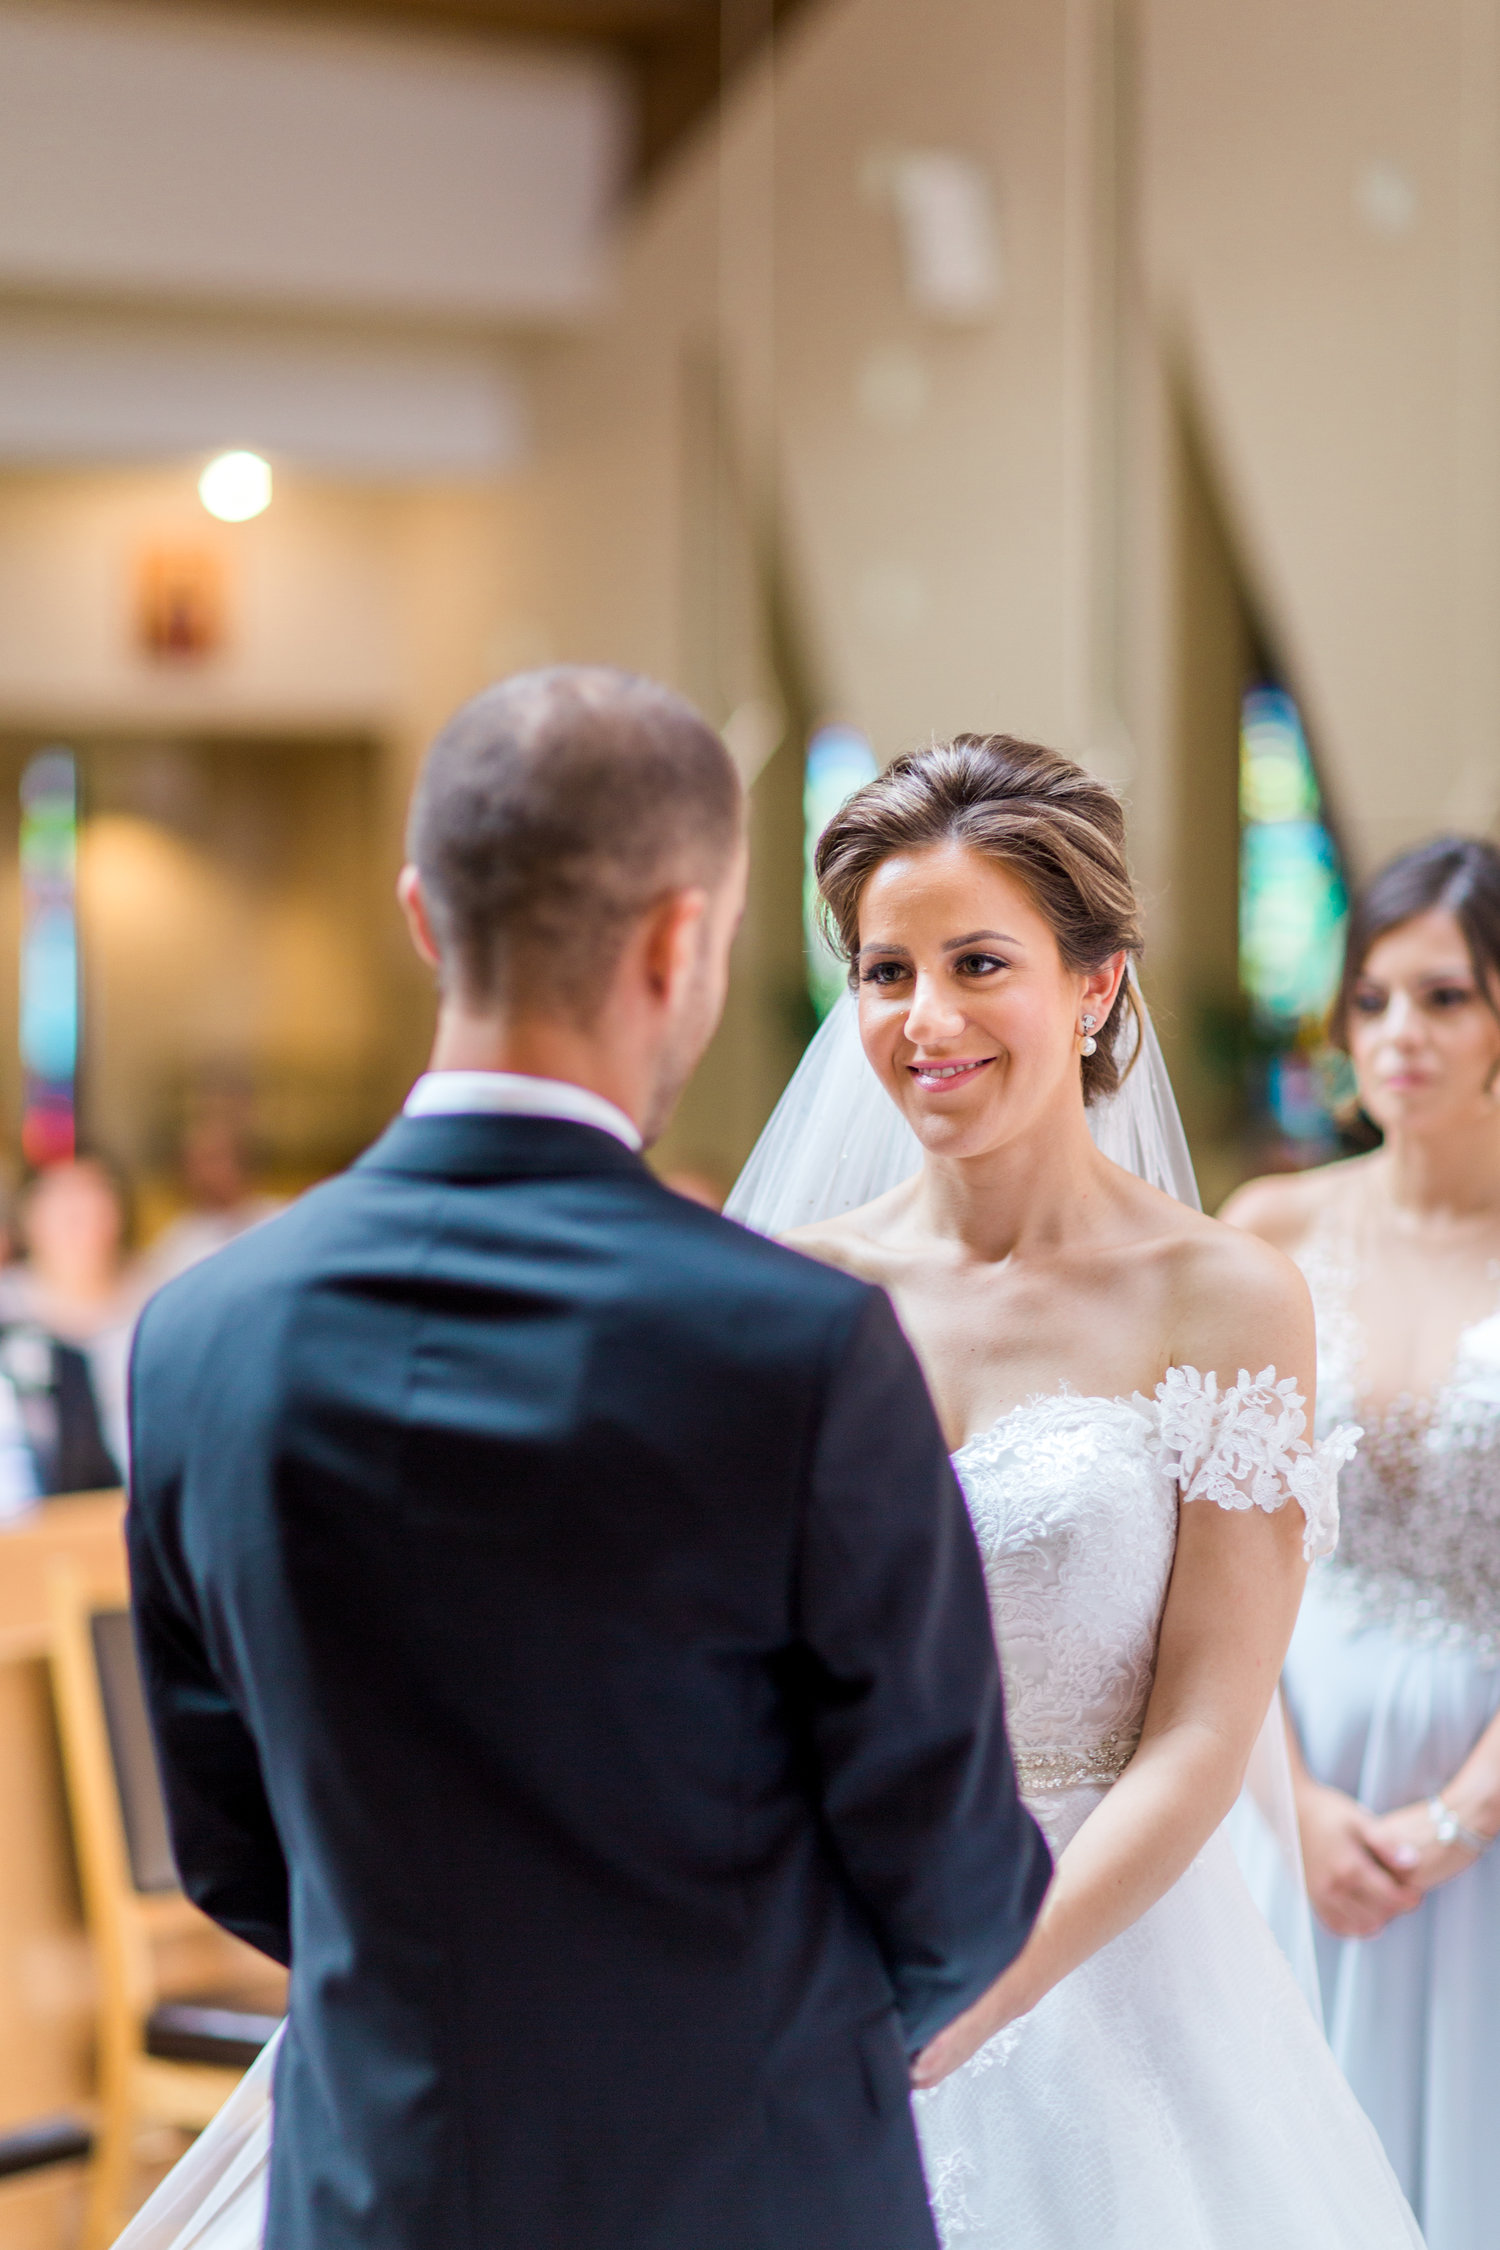 Danielle-Giroux-Amir-Golbazi-Toronto-Wedding-Photographer-Bellvue-Manor_DeLuca_1-391.jpg